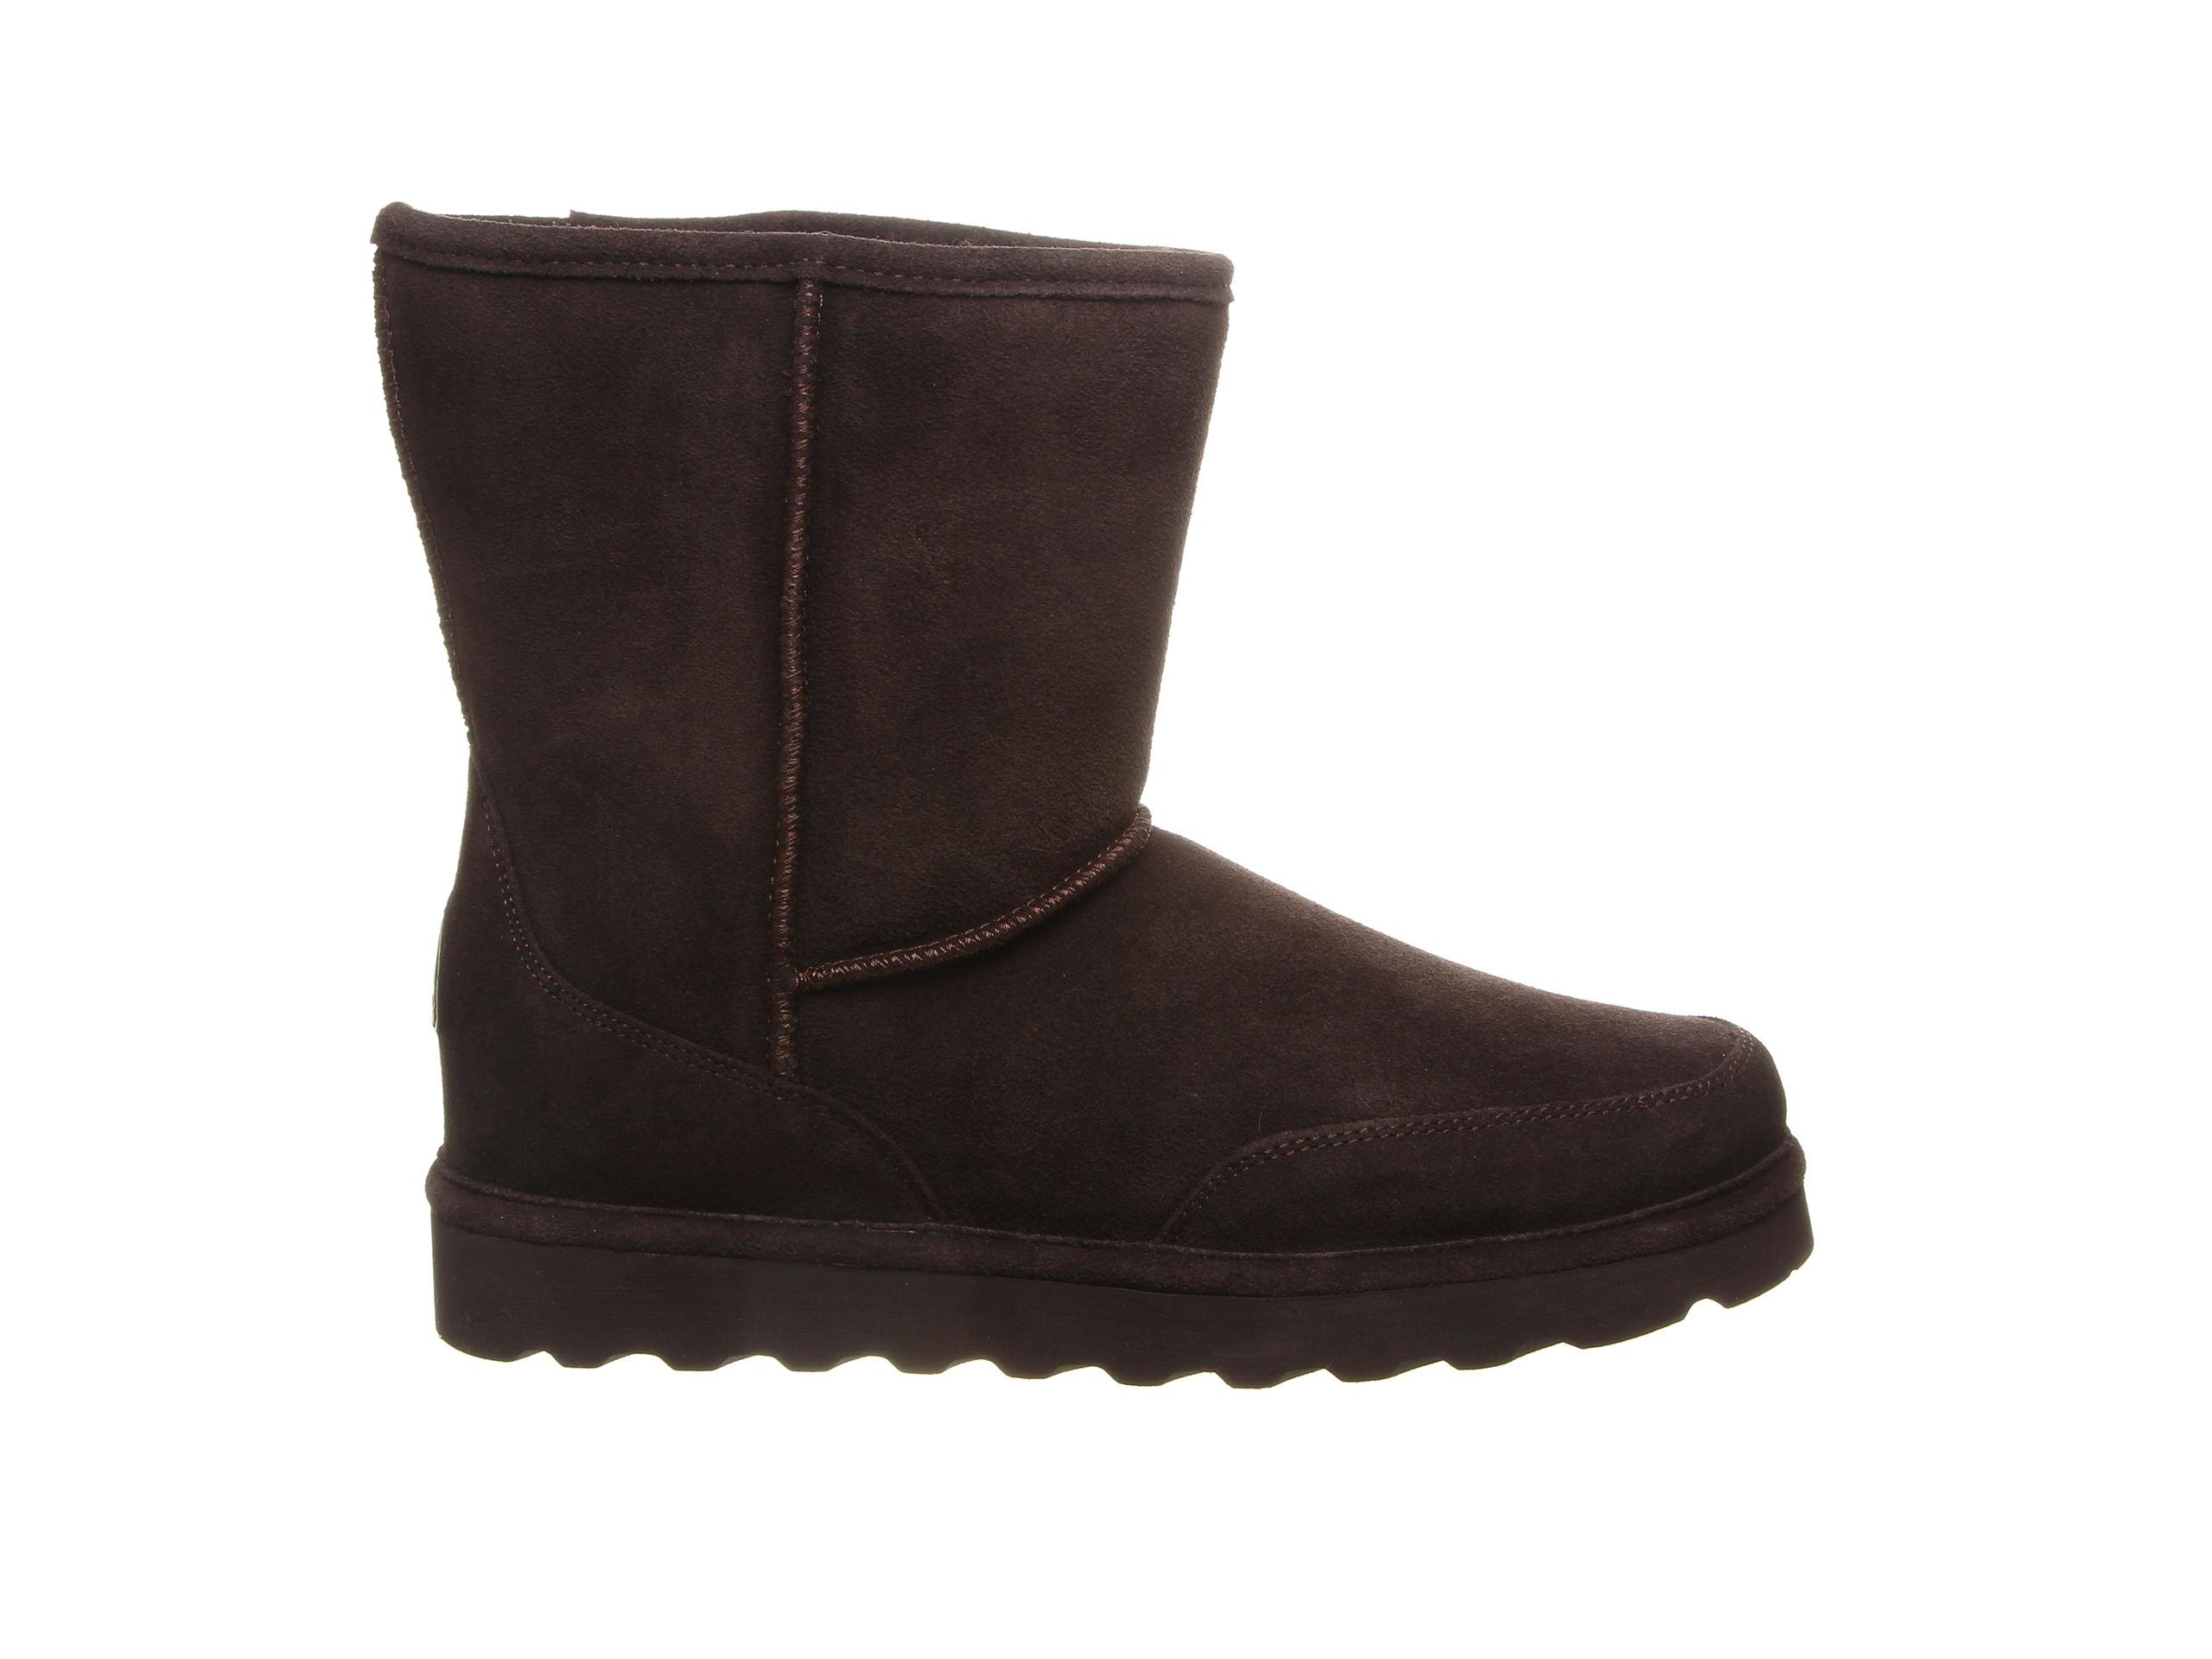 Bearpaw Brady Men's Boots (Brown Suede)